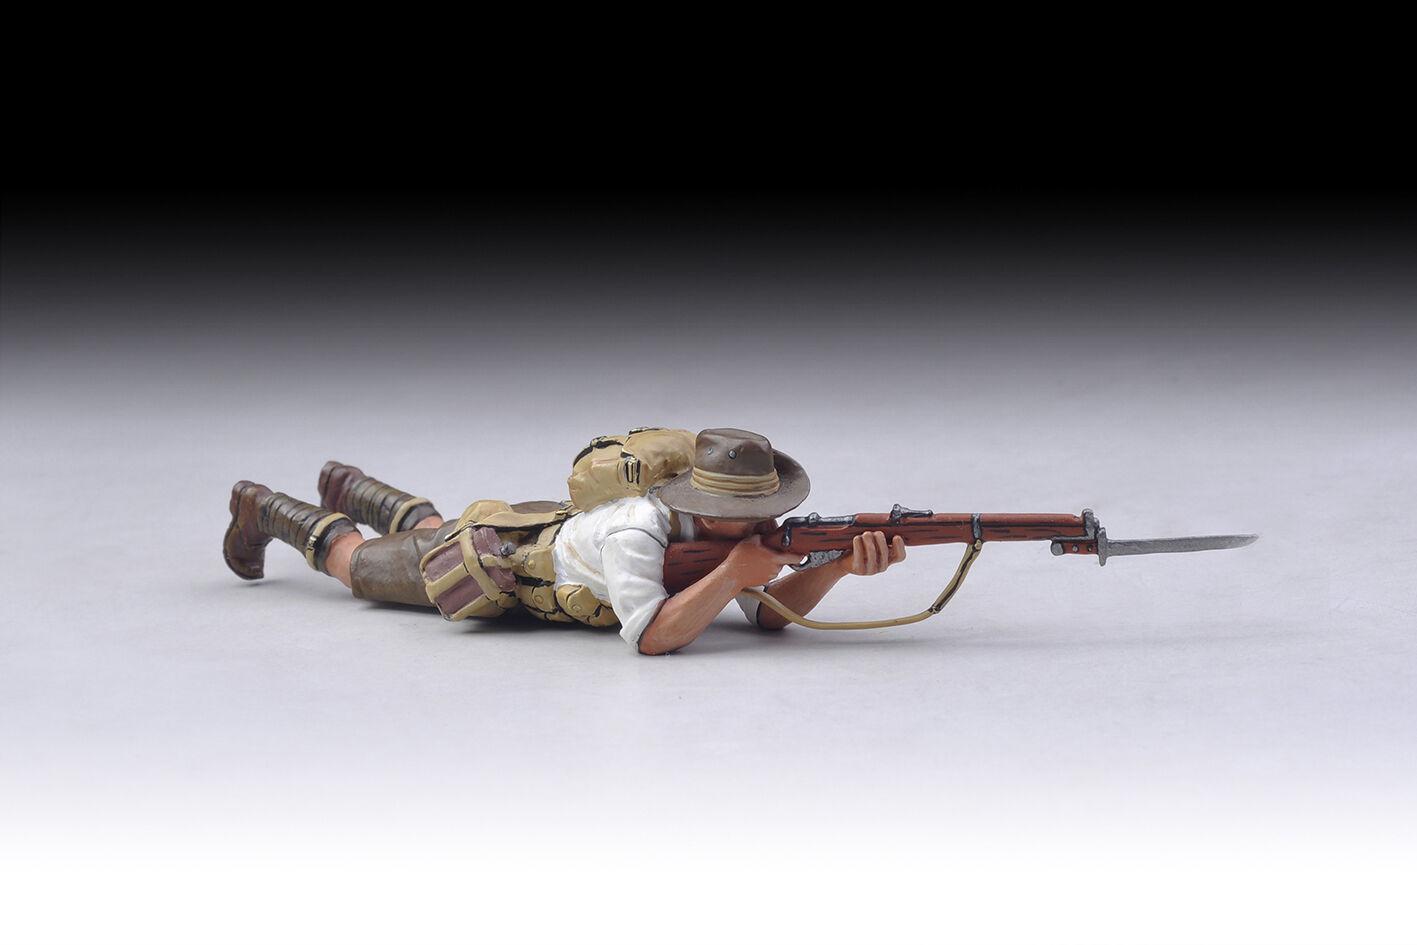 THOMAS GUNN GW057B - Aussie Lying Down White Shirt WW1 Painted Diecast Metal